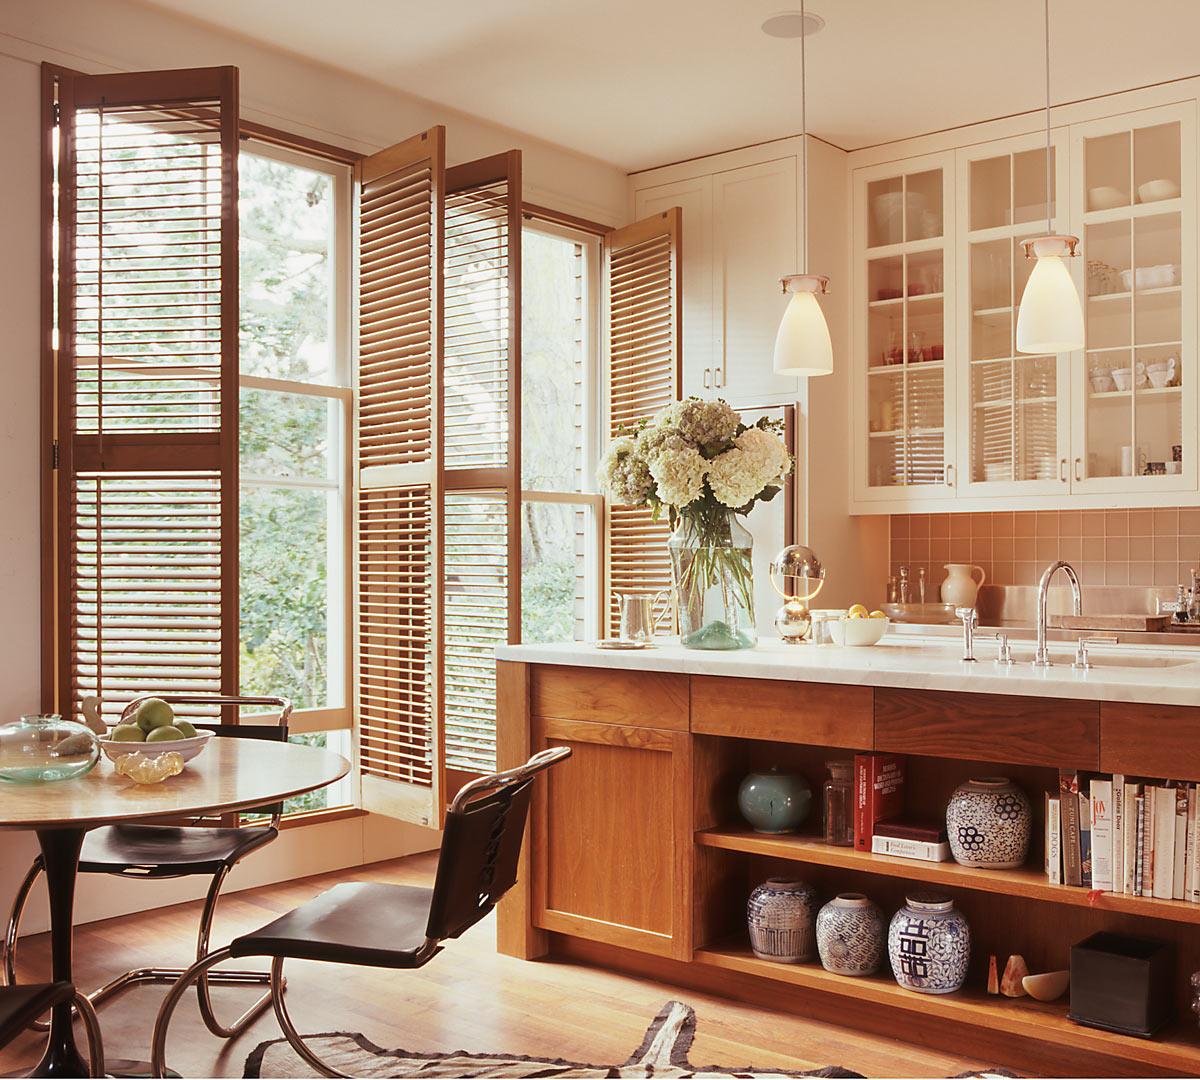 Cumberland San Francisco Kitchen - interior design by BAMO